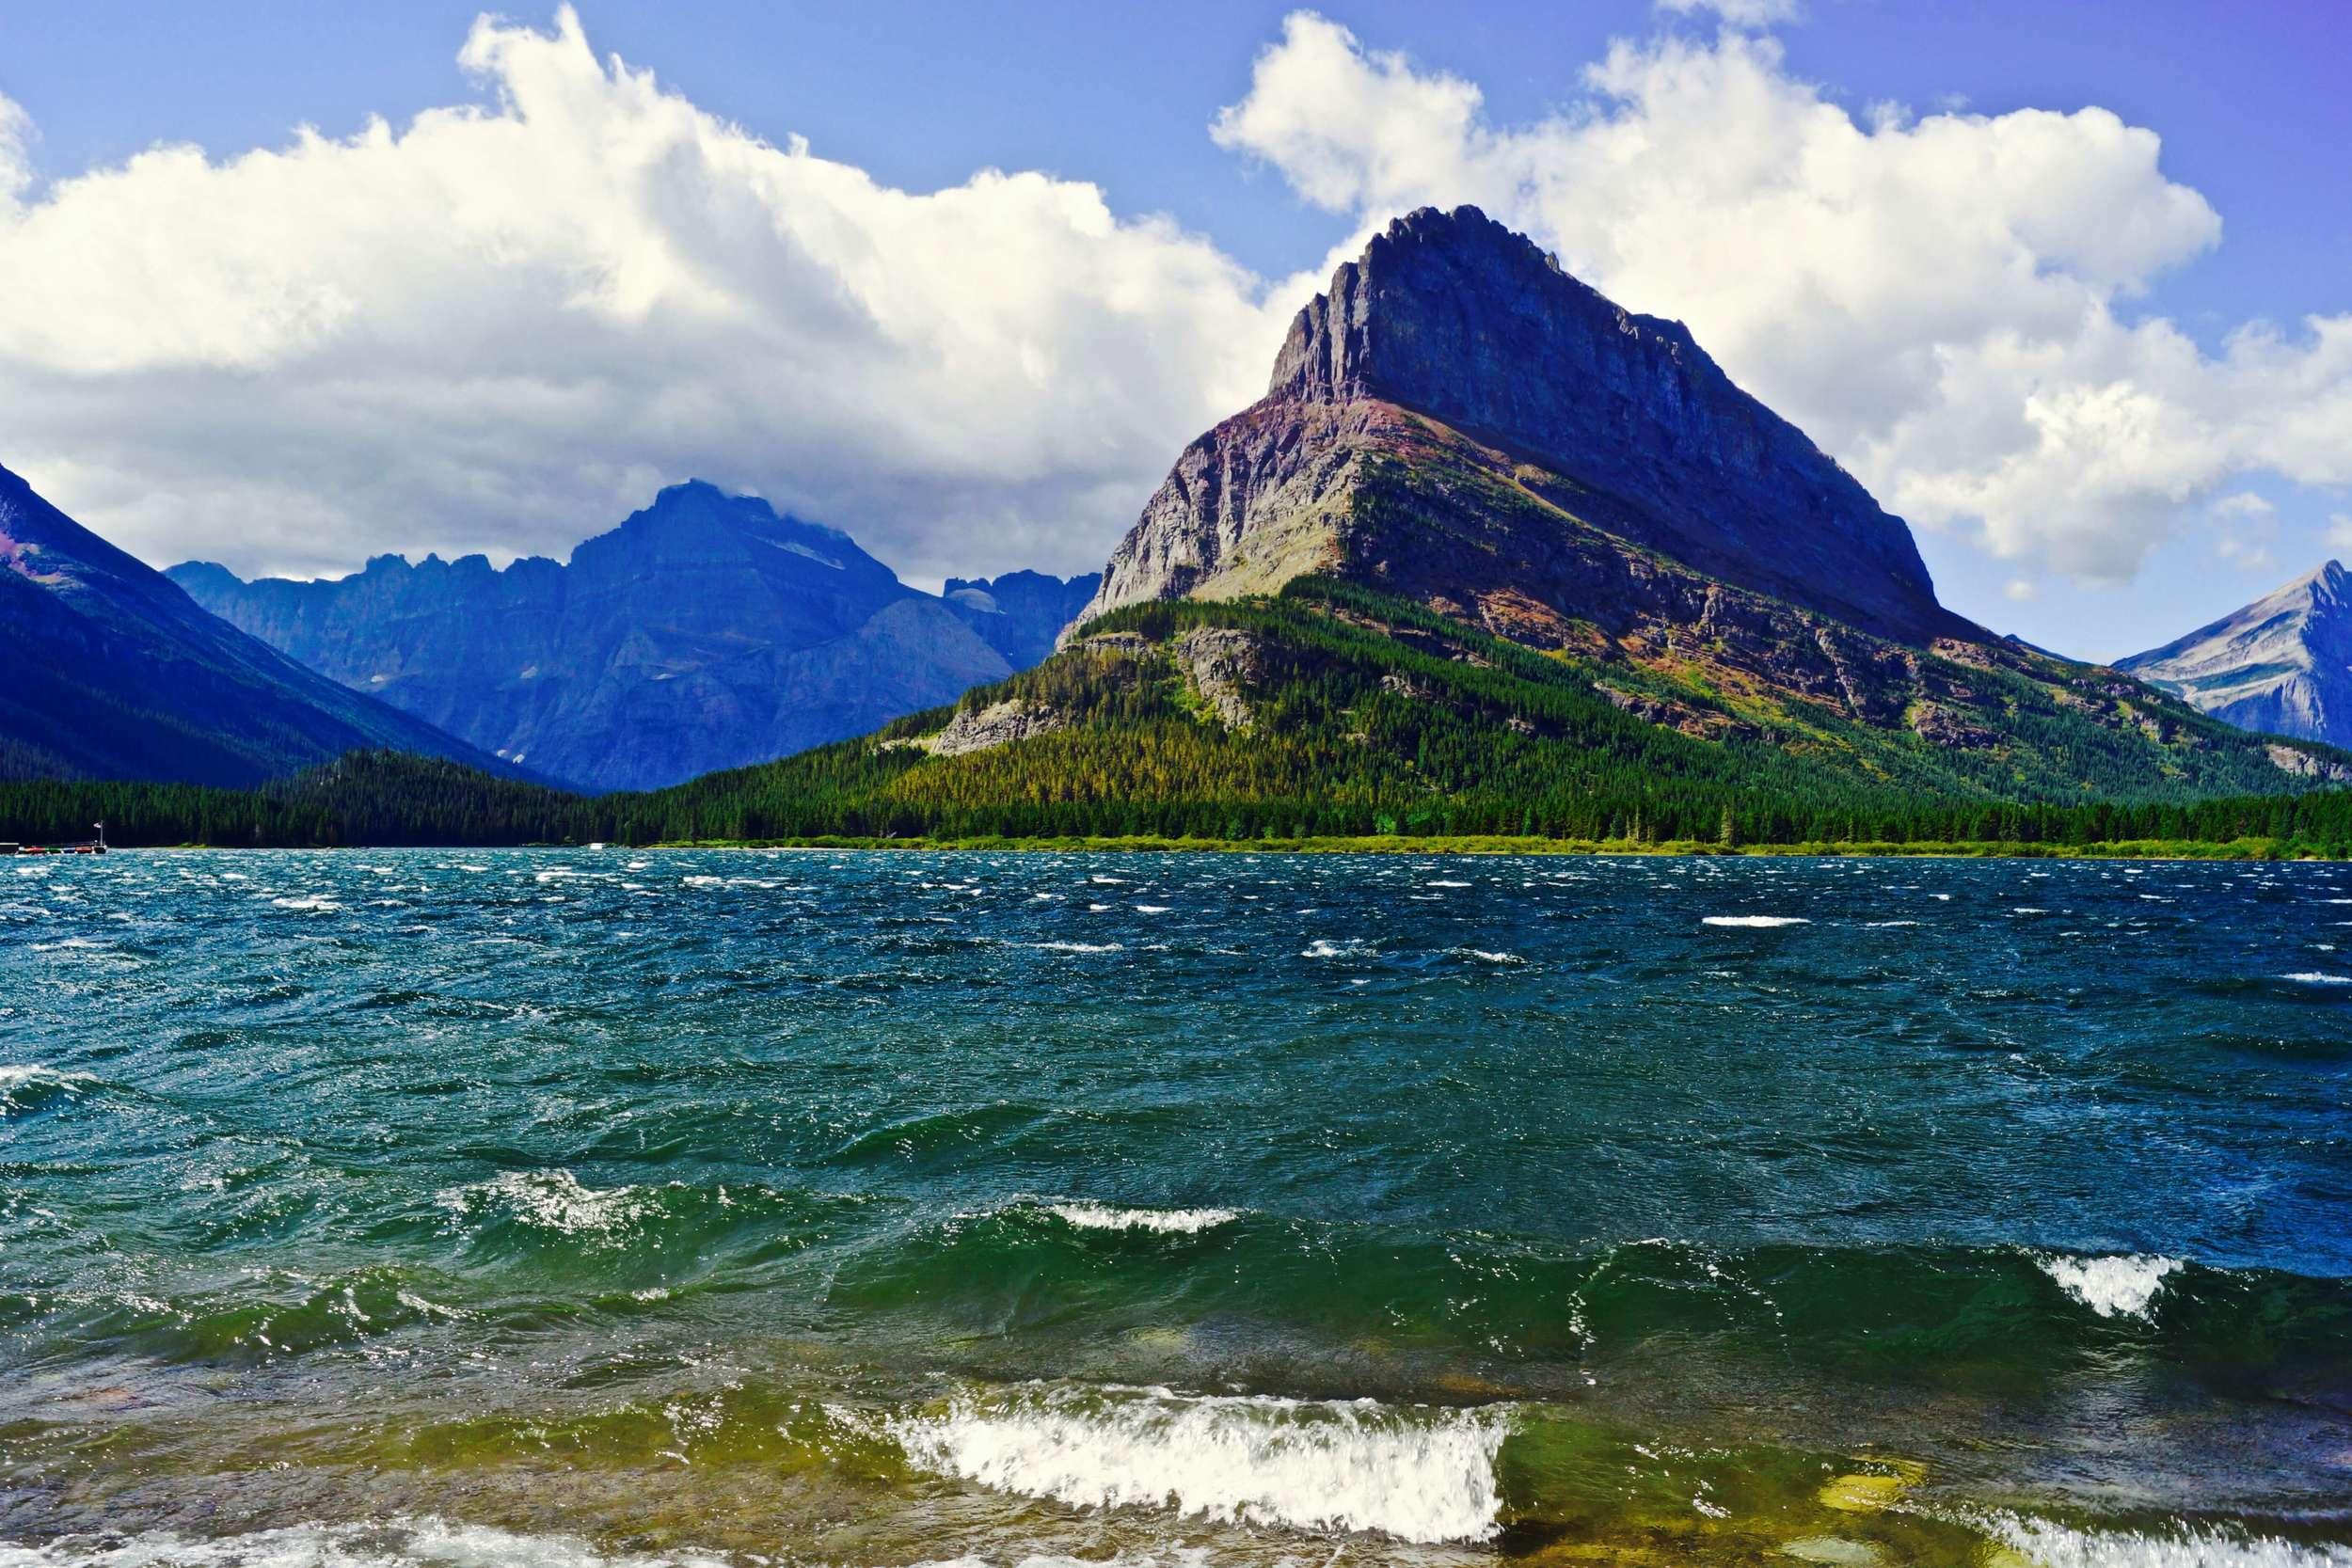 Many Glacier, Glacier National Park, Montana, August 2015